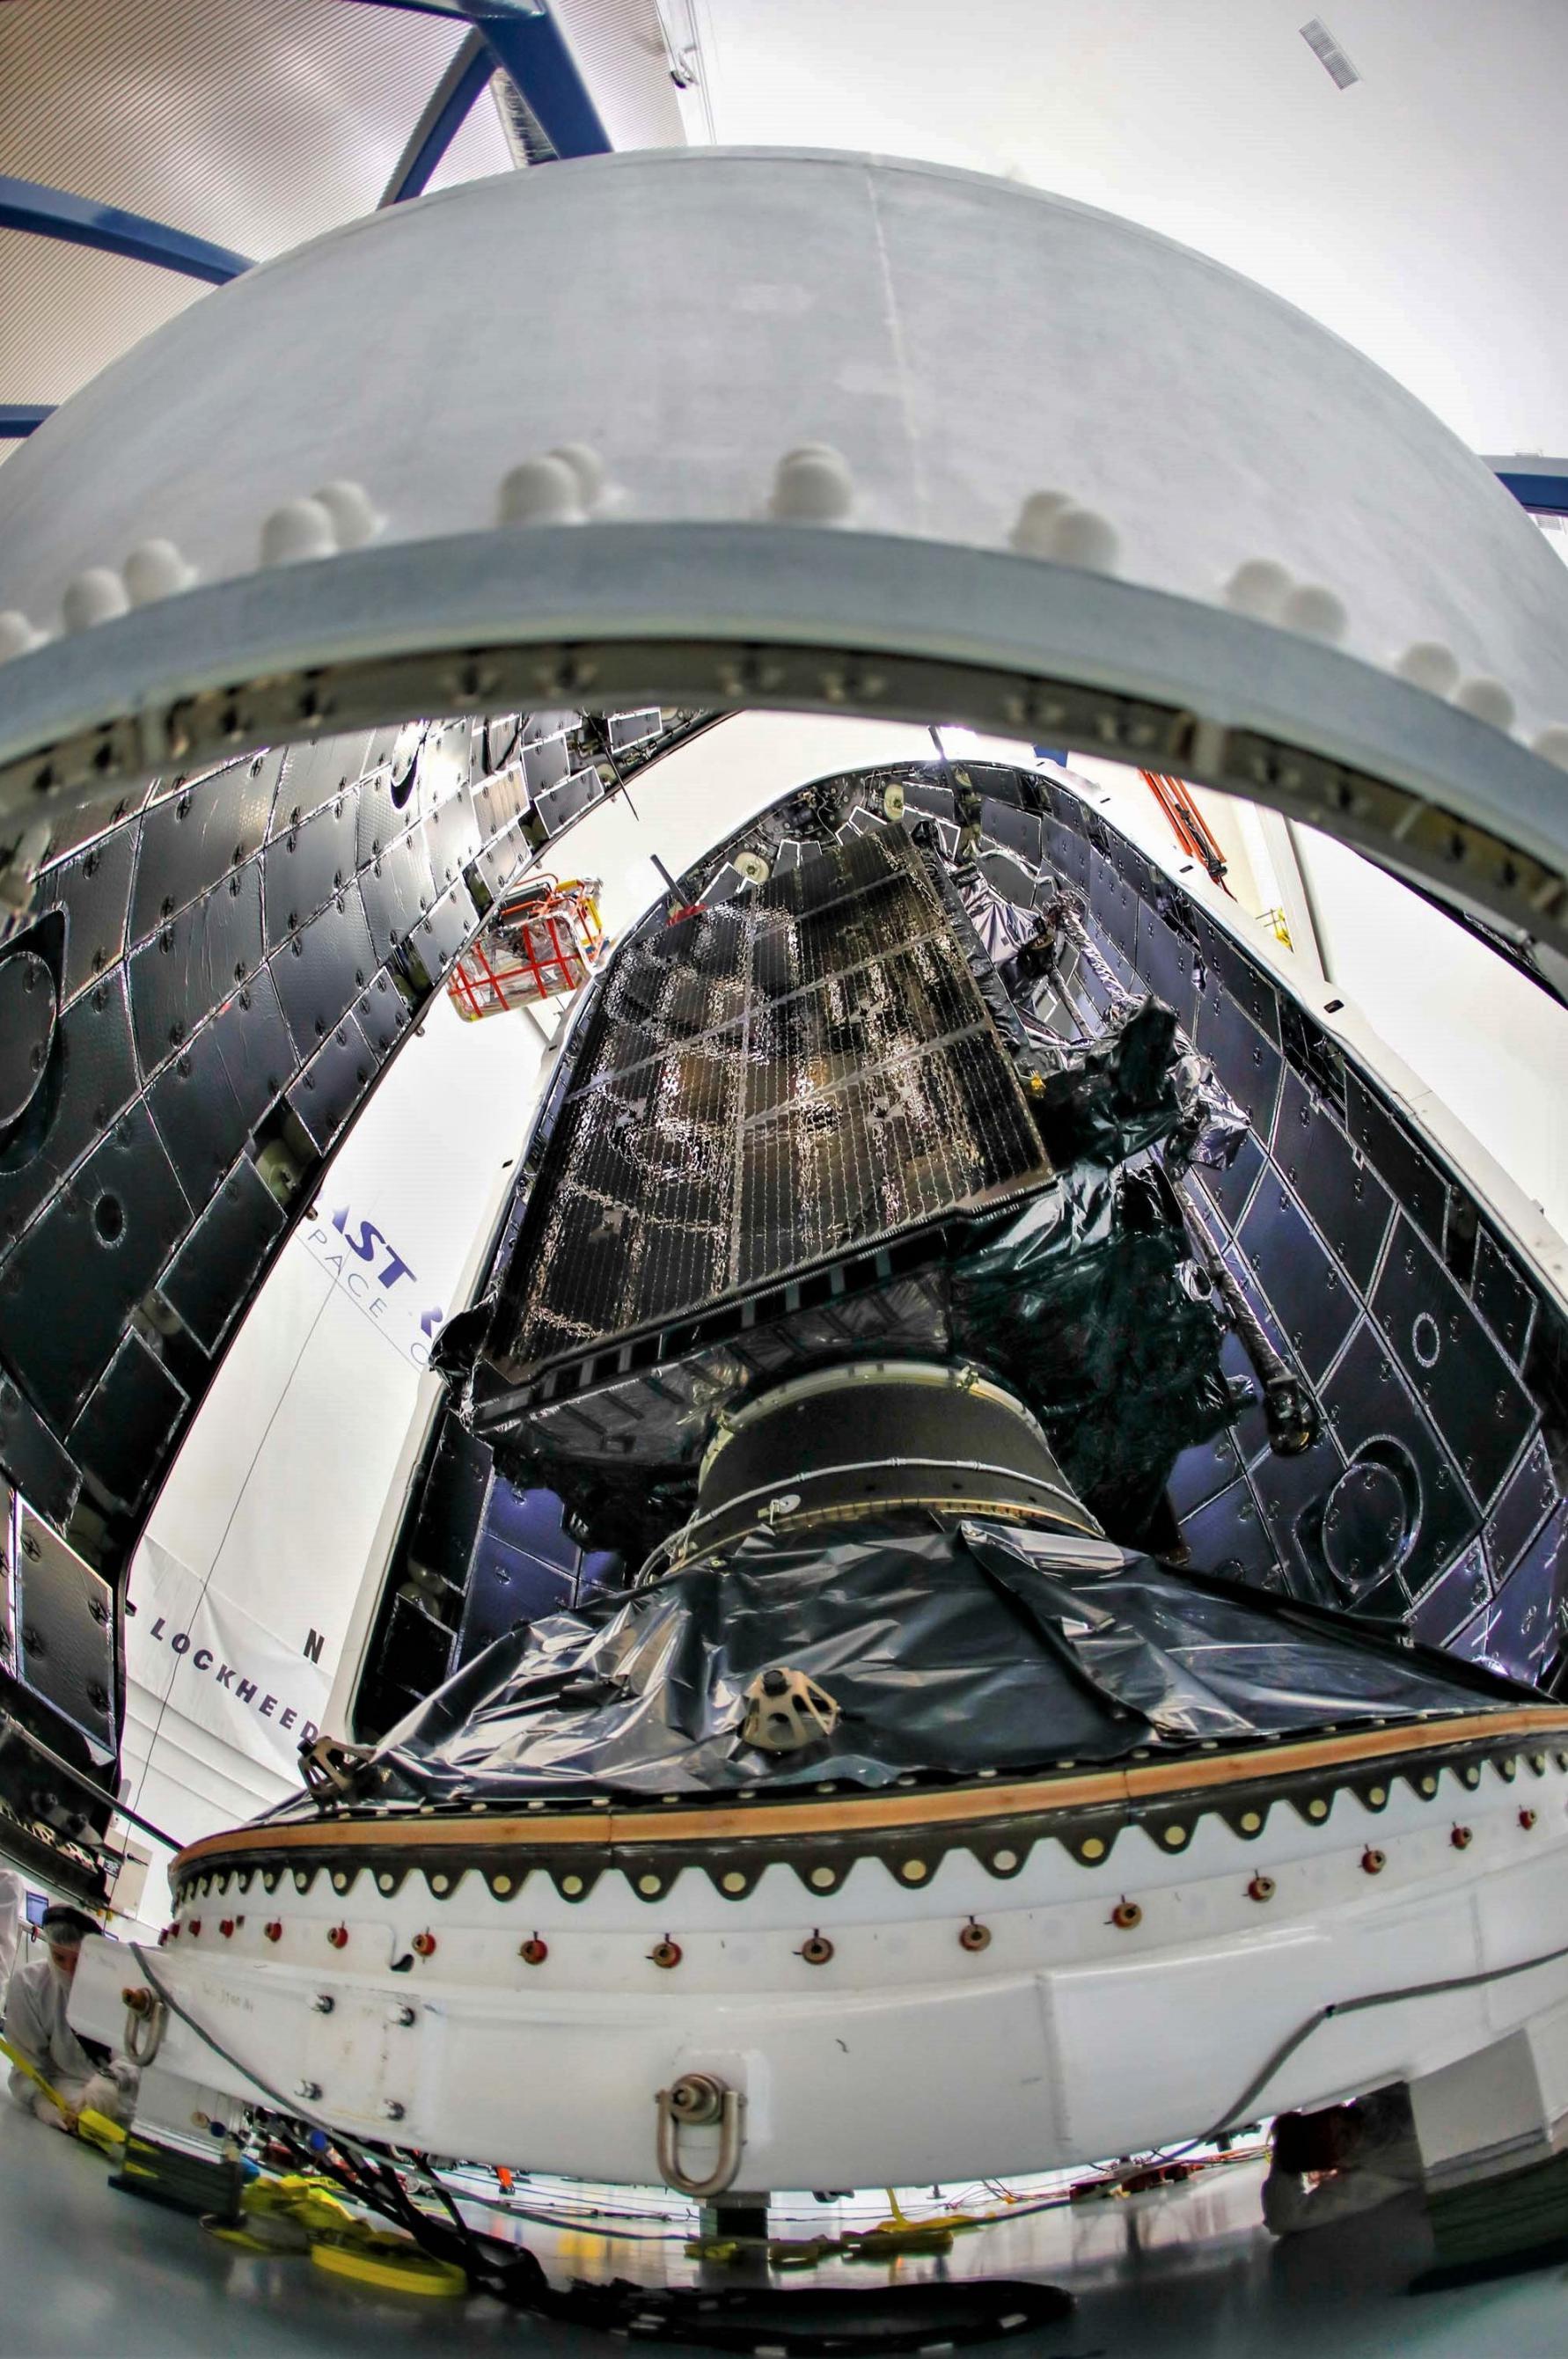 GPS III SV01 Falcon 9 encapsulation 120718 (Lockheed Martin) 1(c)